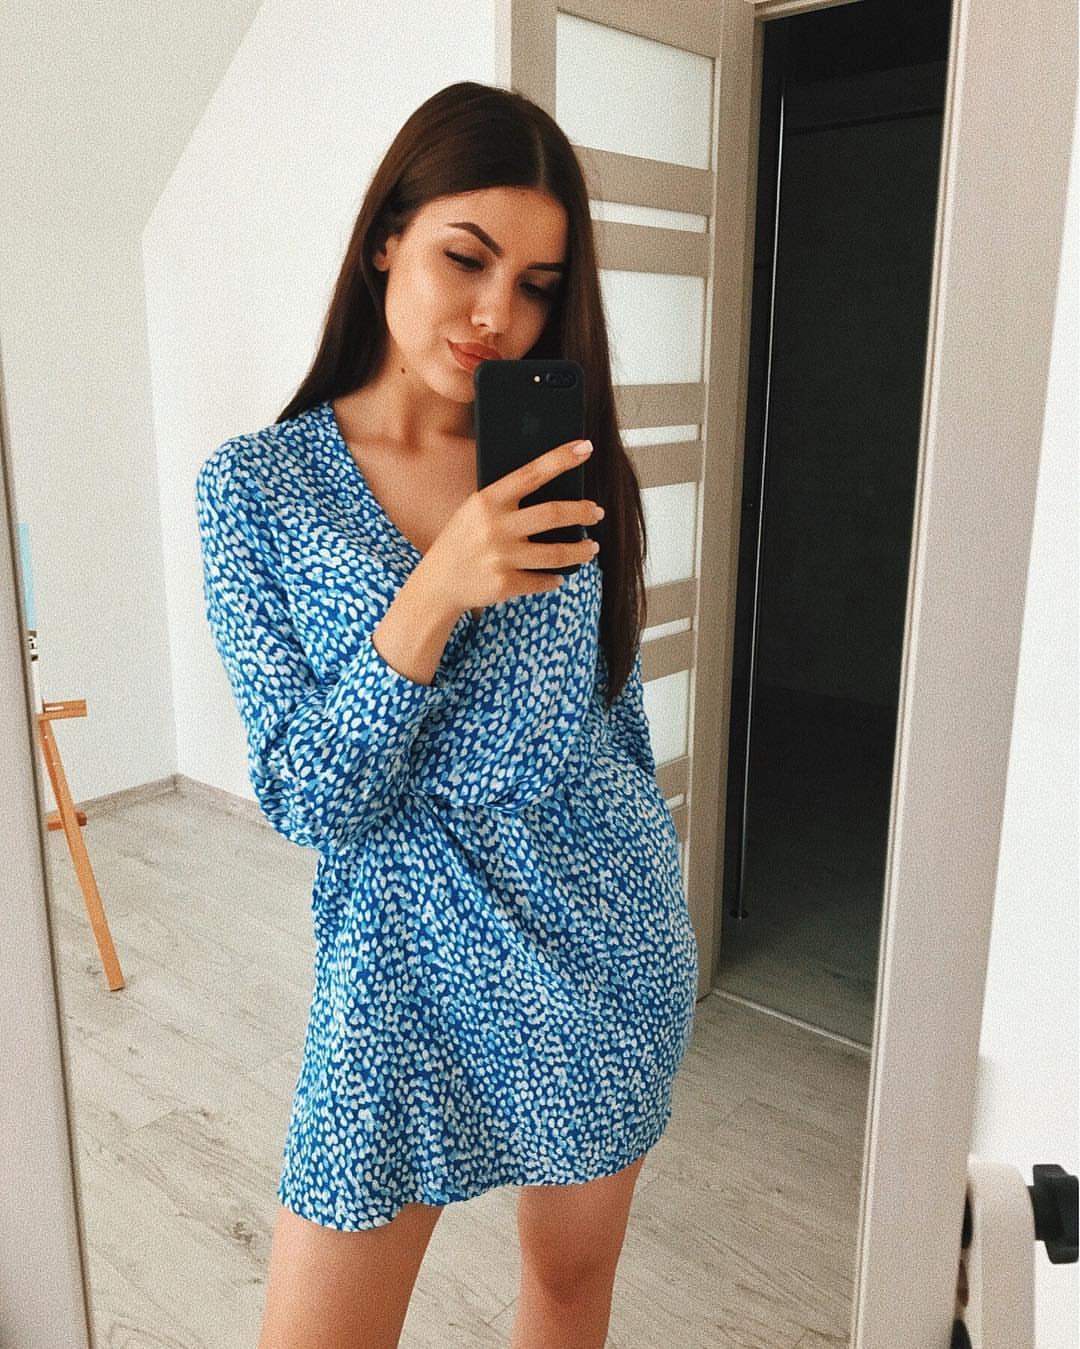 Bachelor Ukraine - Season 10 - Max Mihailuk - Contestants  - *Sleuthing Spoilers* RgAjcnk370M